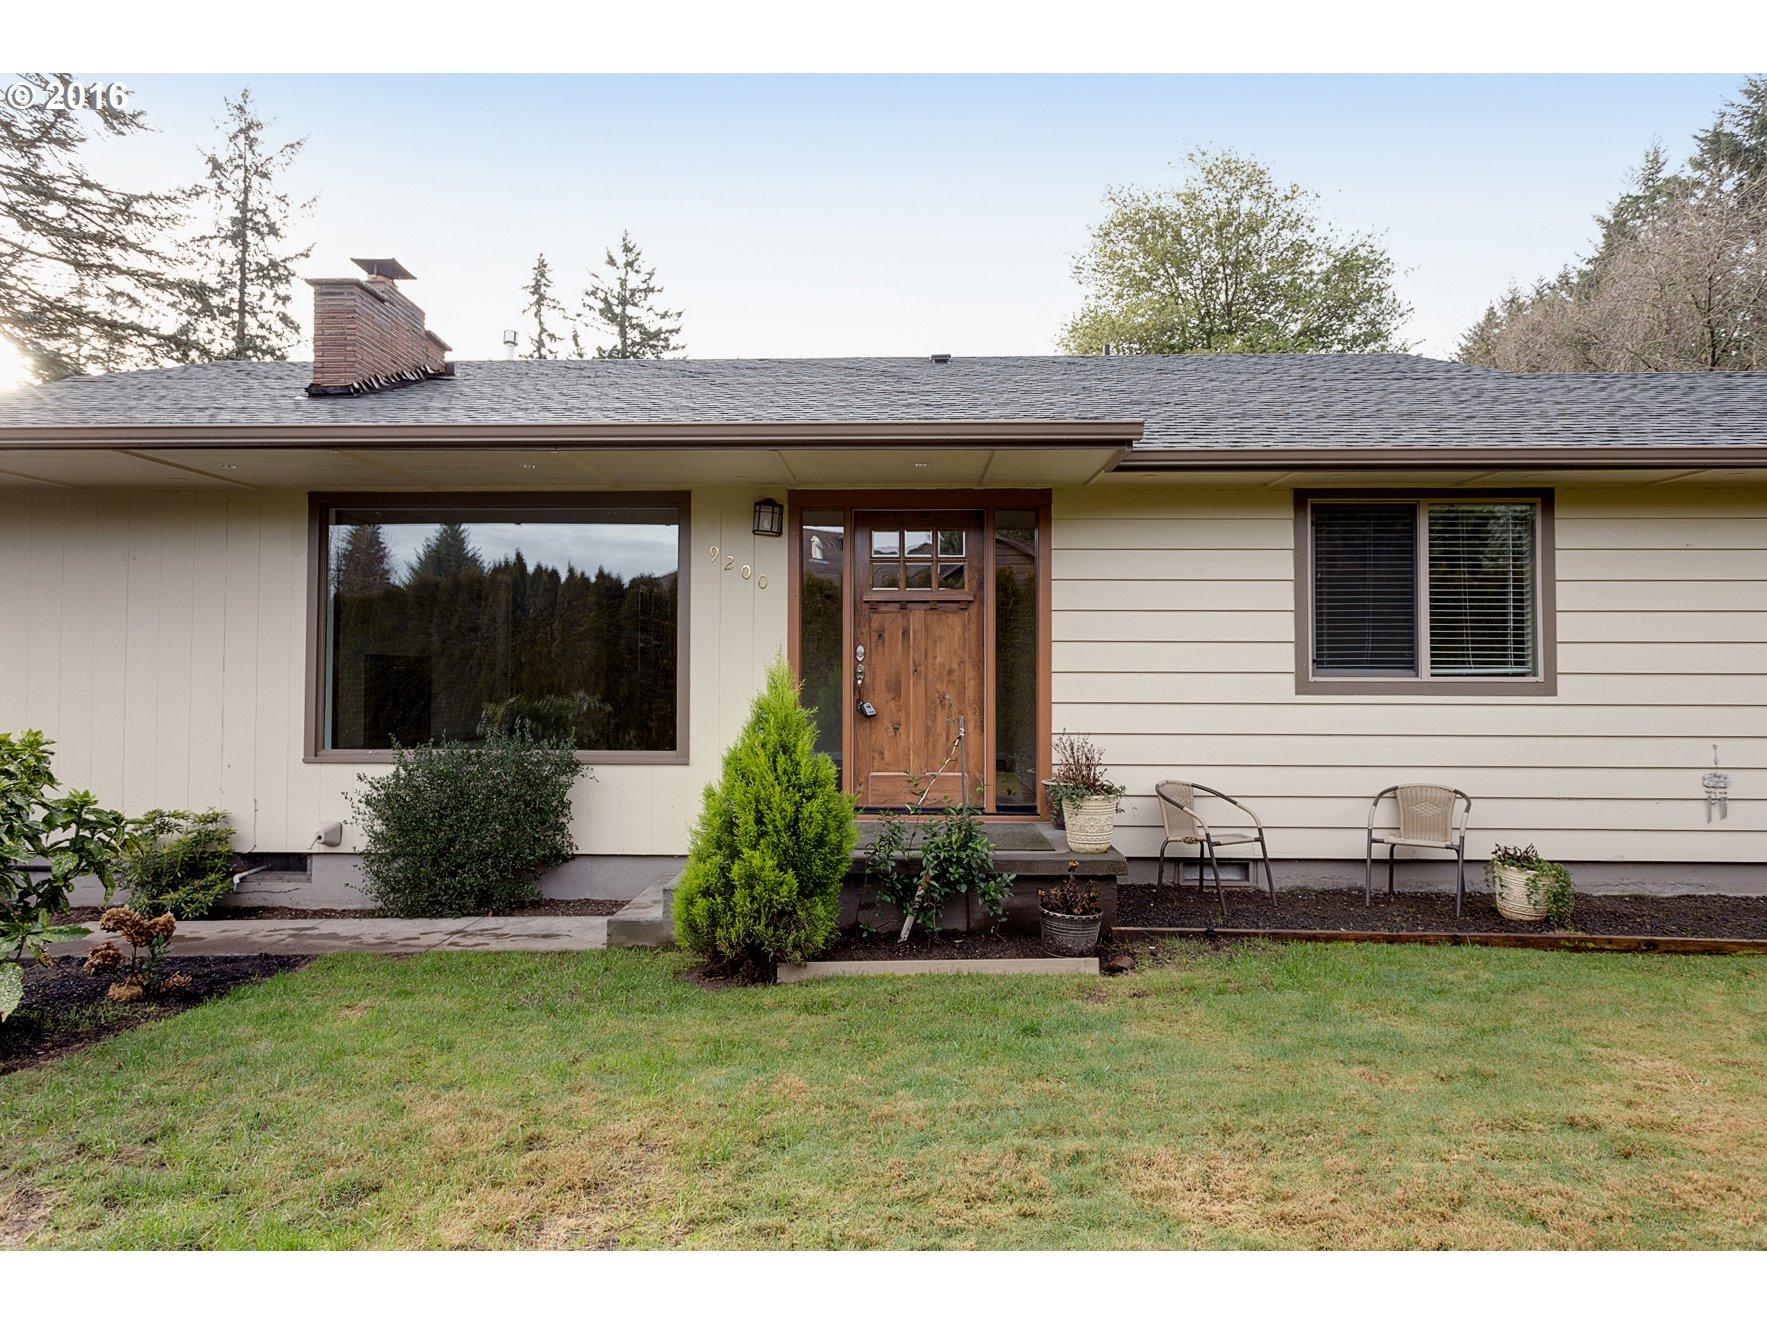 9200 SW Edgewood St, Portland, OR